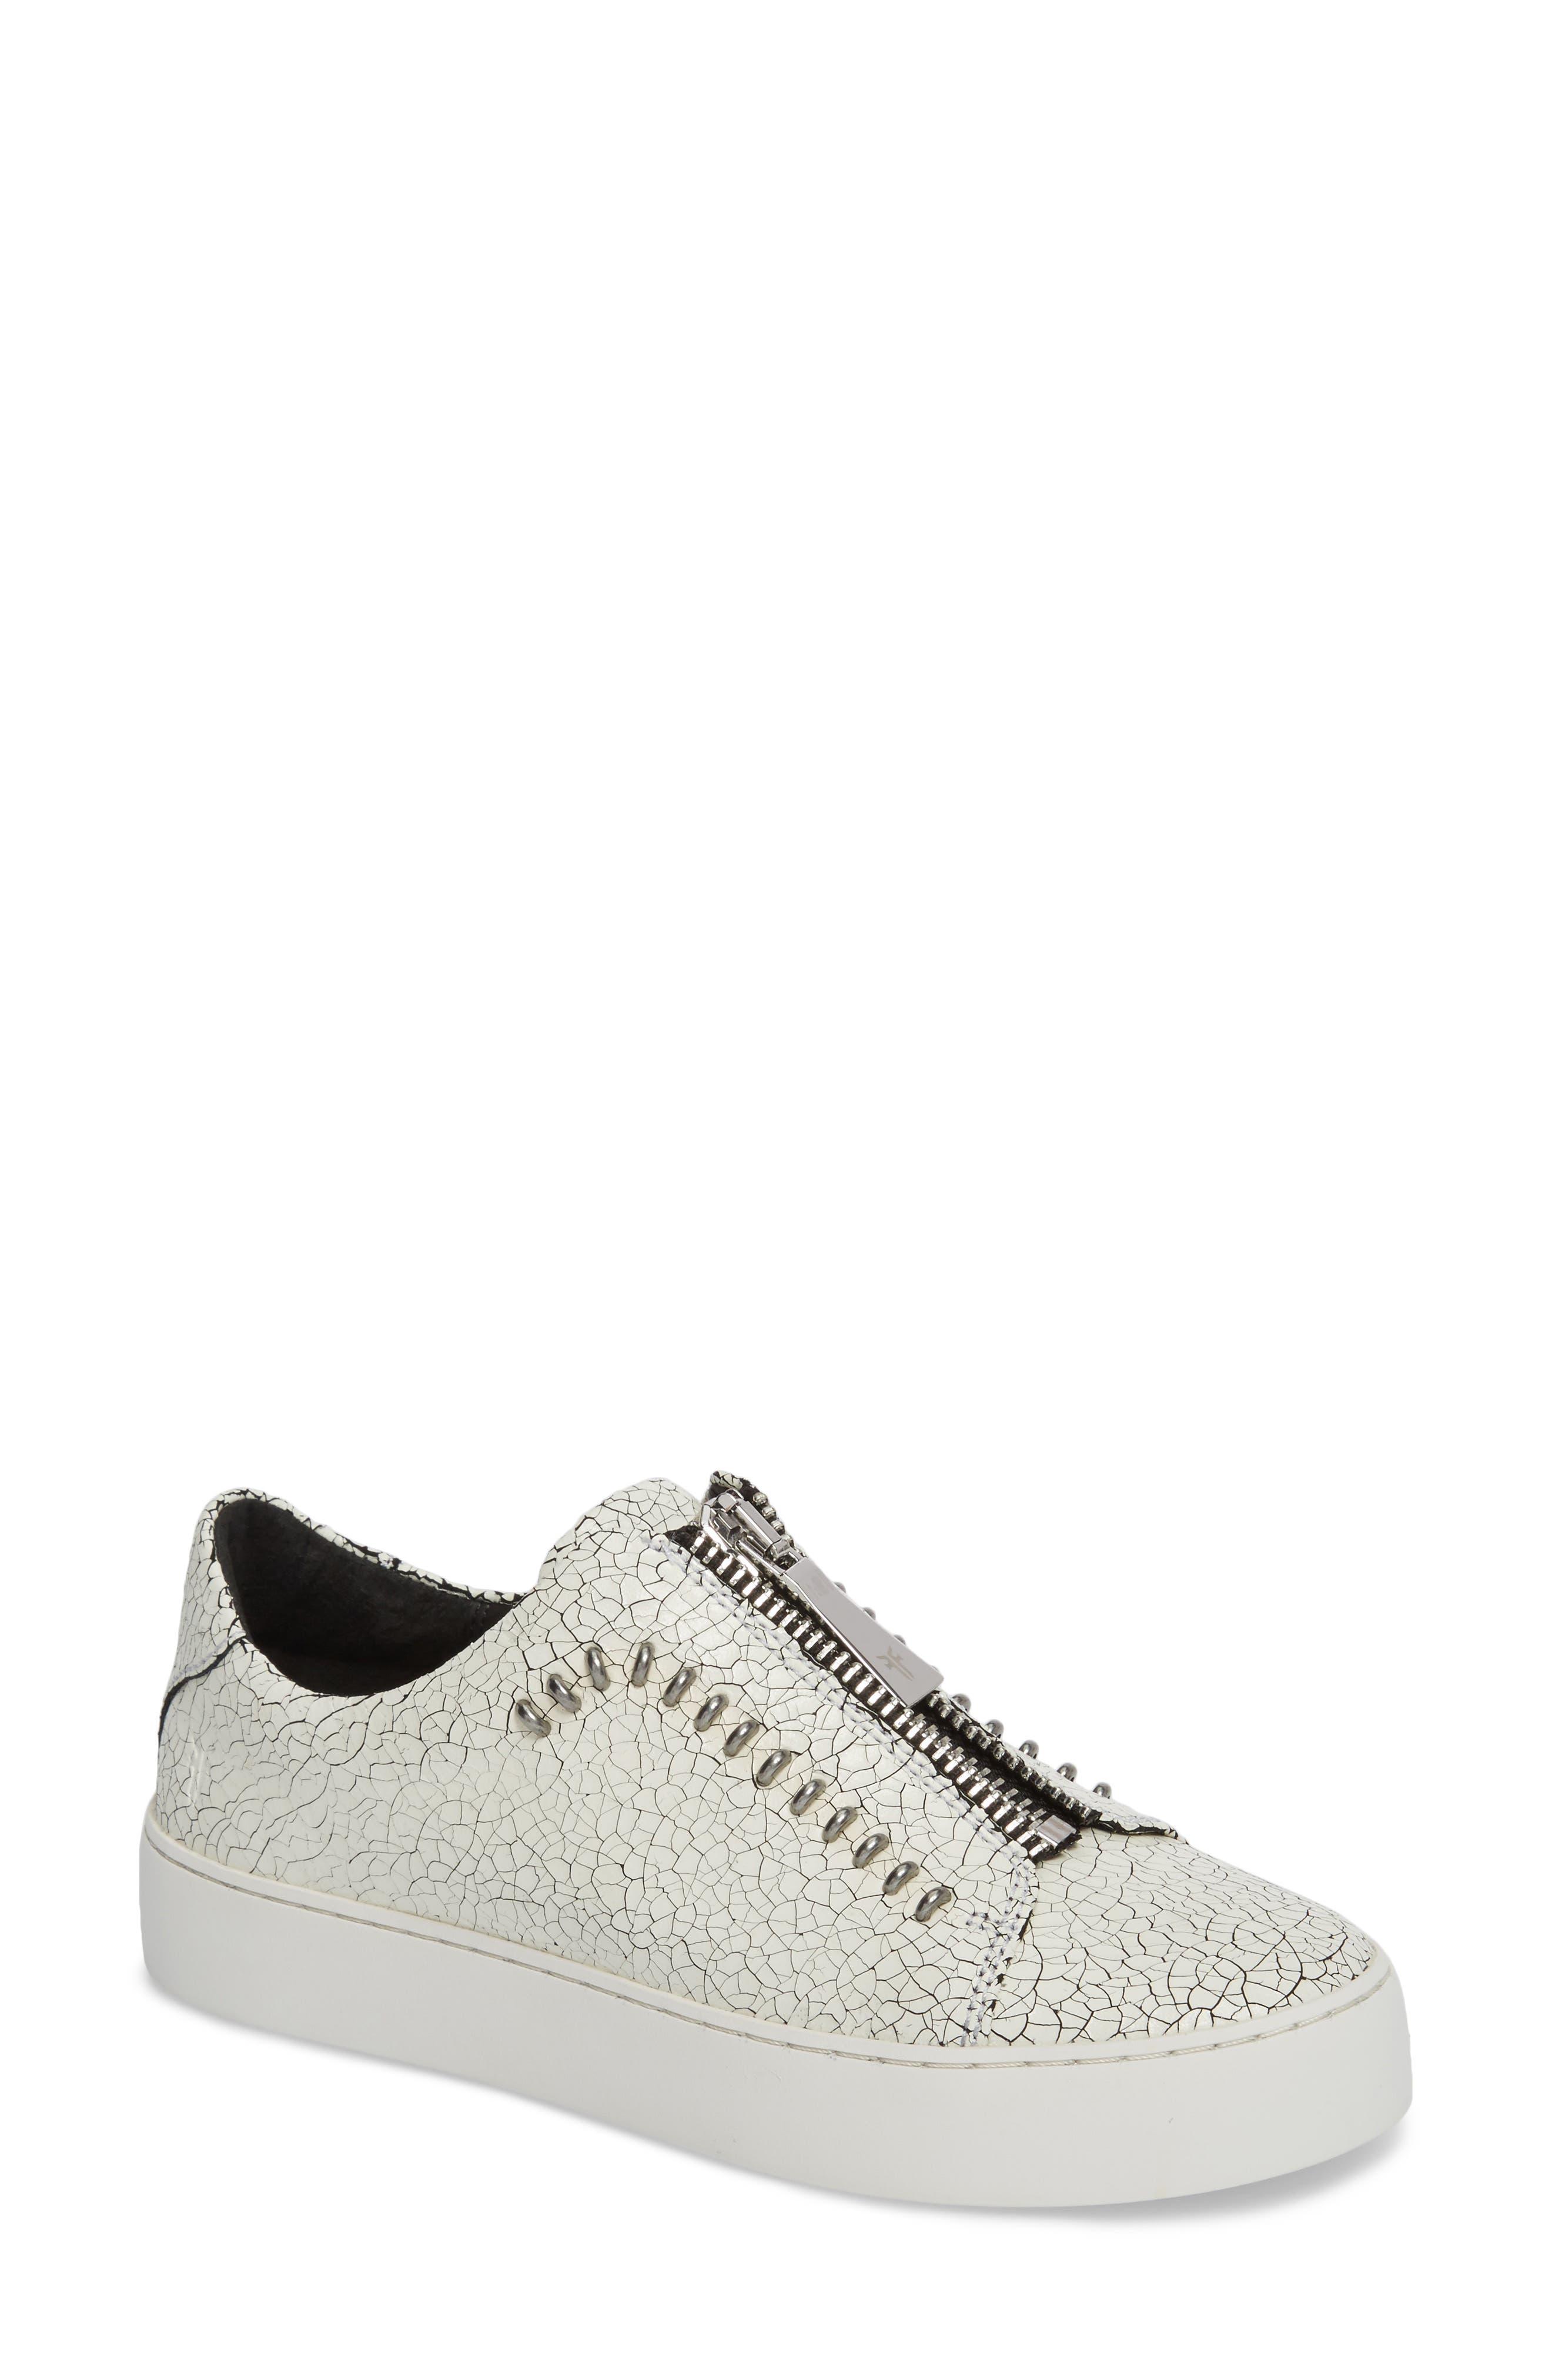 Lena Rebel Zip Sneaker,                         Main,                         color, White Leather